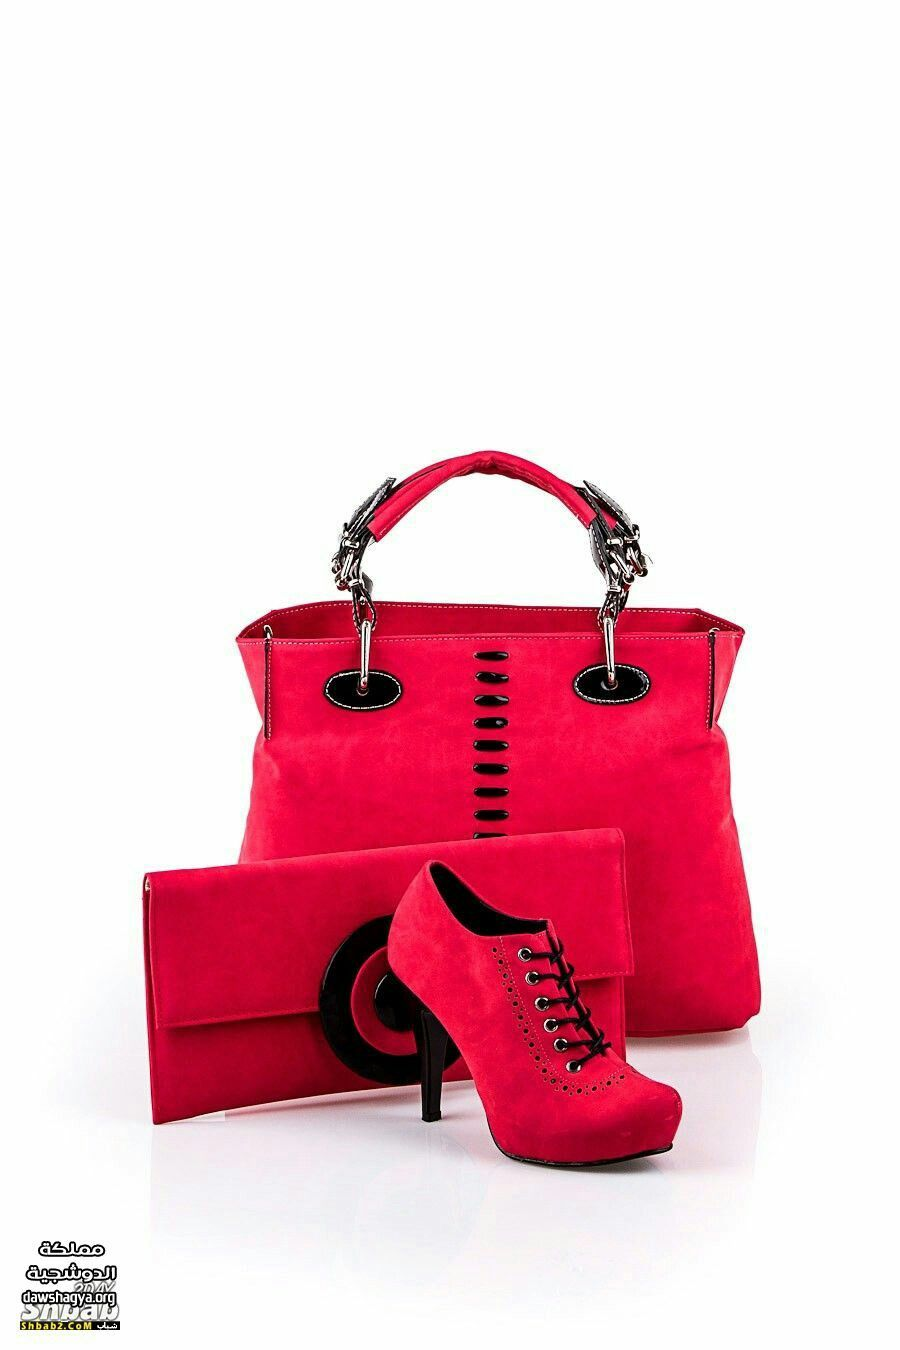 Pin By ملكة الاحساس On حقائب واحذية بنات كيوت Bags Shoe Bag Shoes